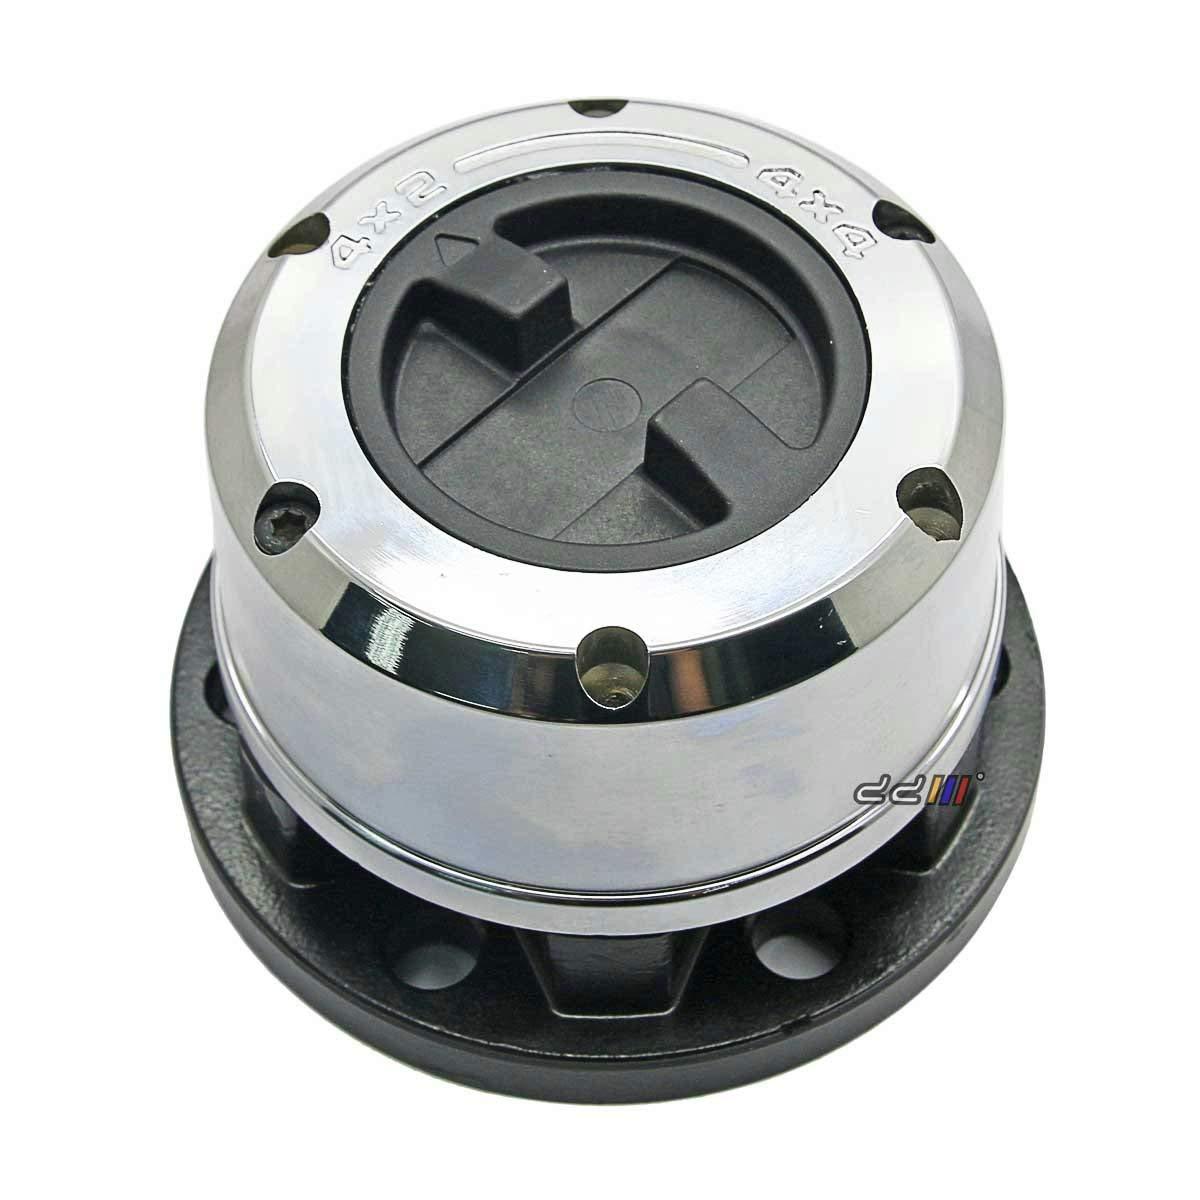 Chrome Dual Seals and 17 Splines WARN 61385 Premium Manual Locking Hub with Zinc Aluminum Alloy Dial 1 Pair